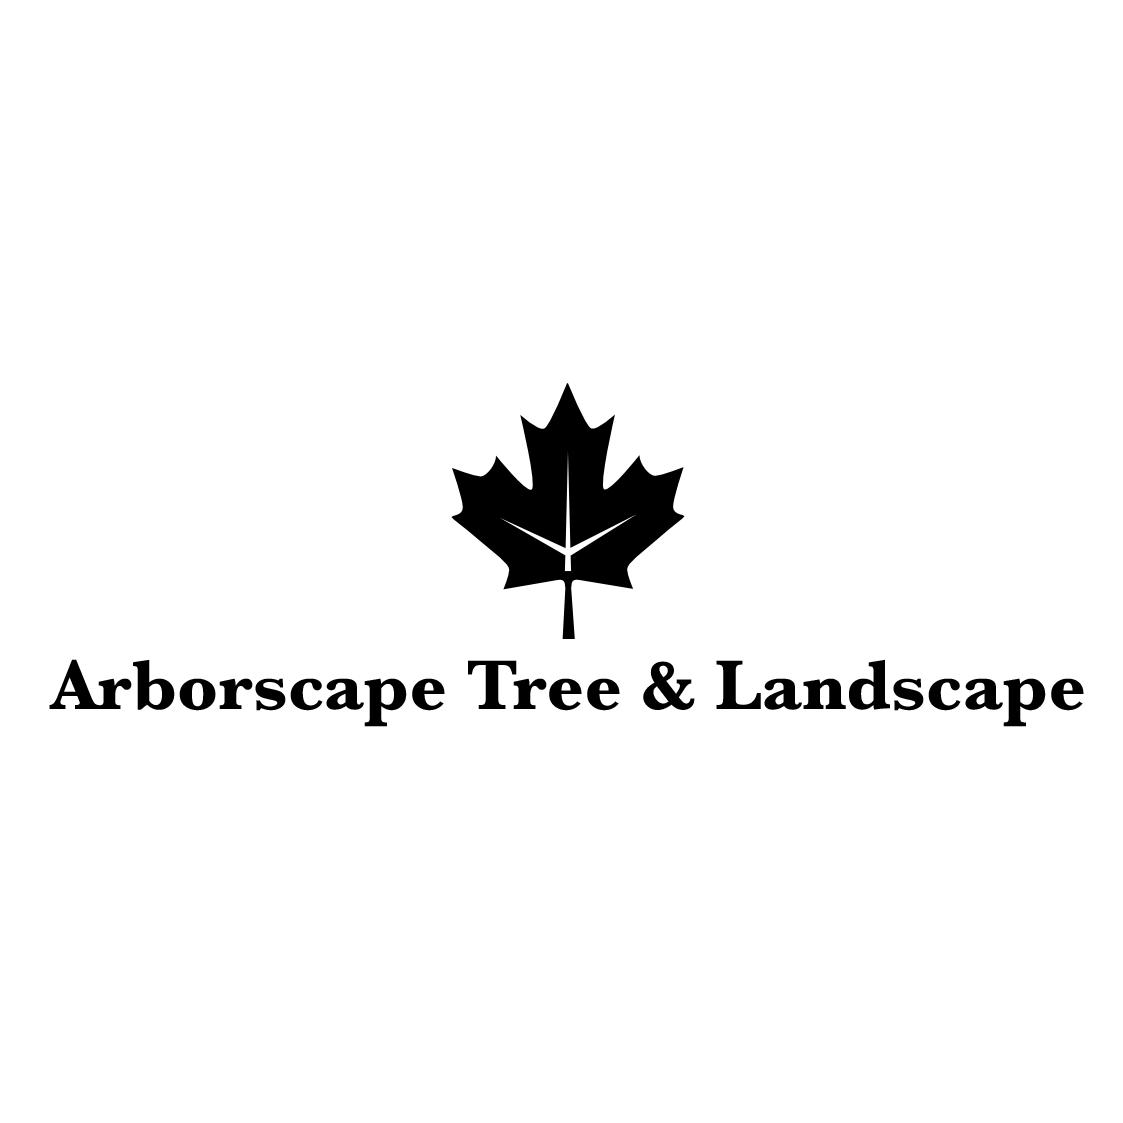 Arborscape Tree & Landscape - Little Falls, MN - Tree Services